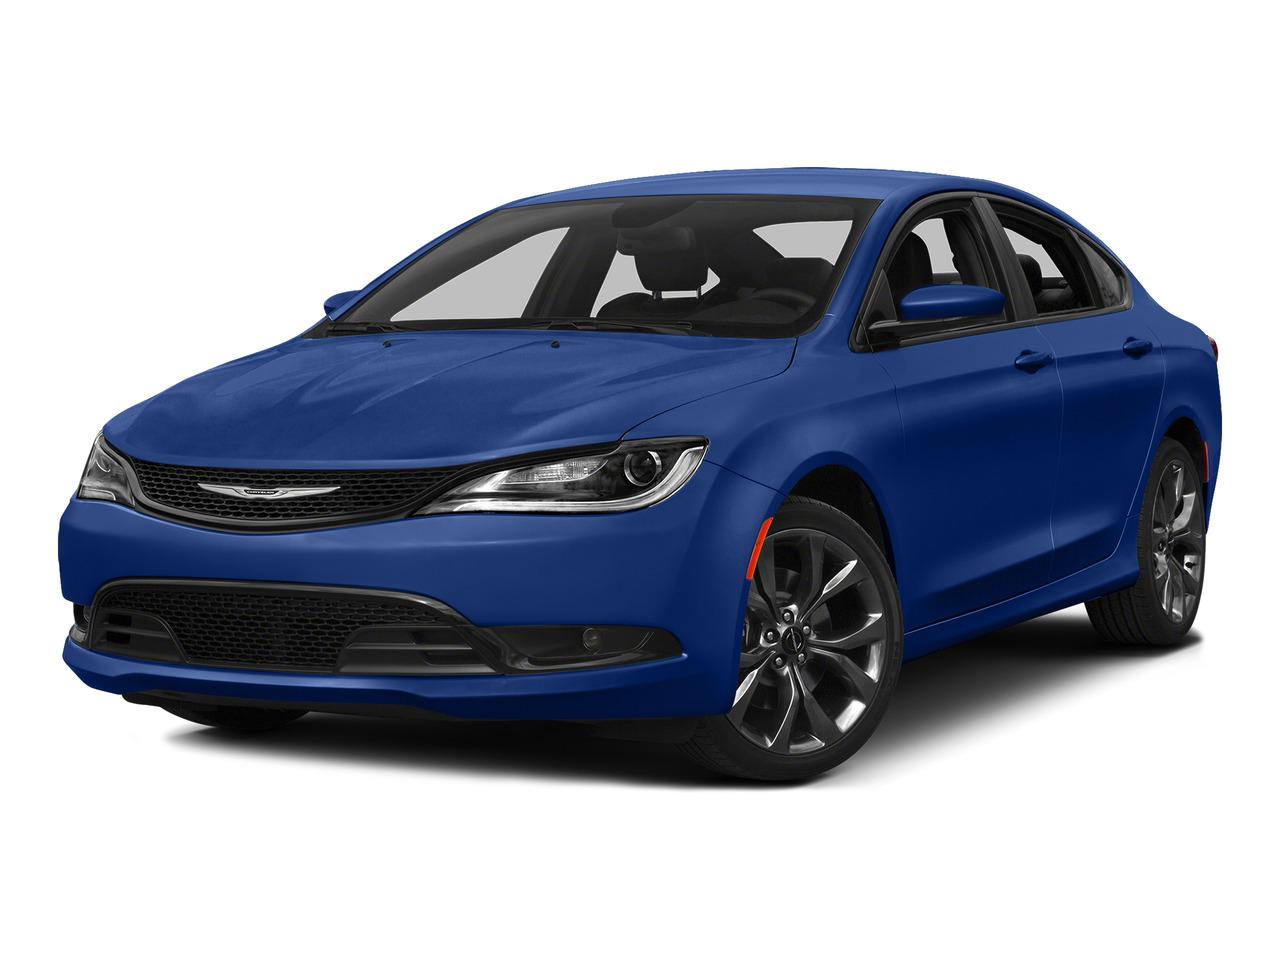 2015 Chrysler 200 S Greensboro NC